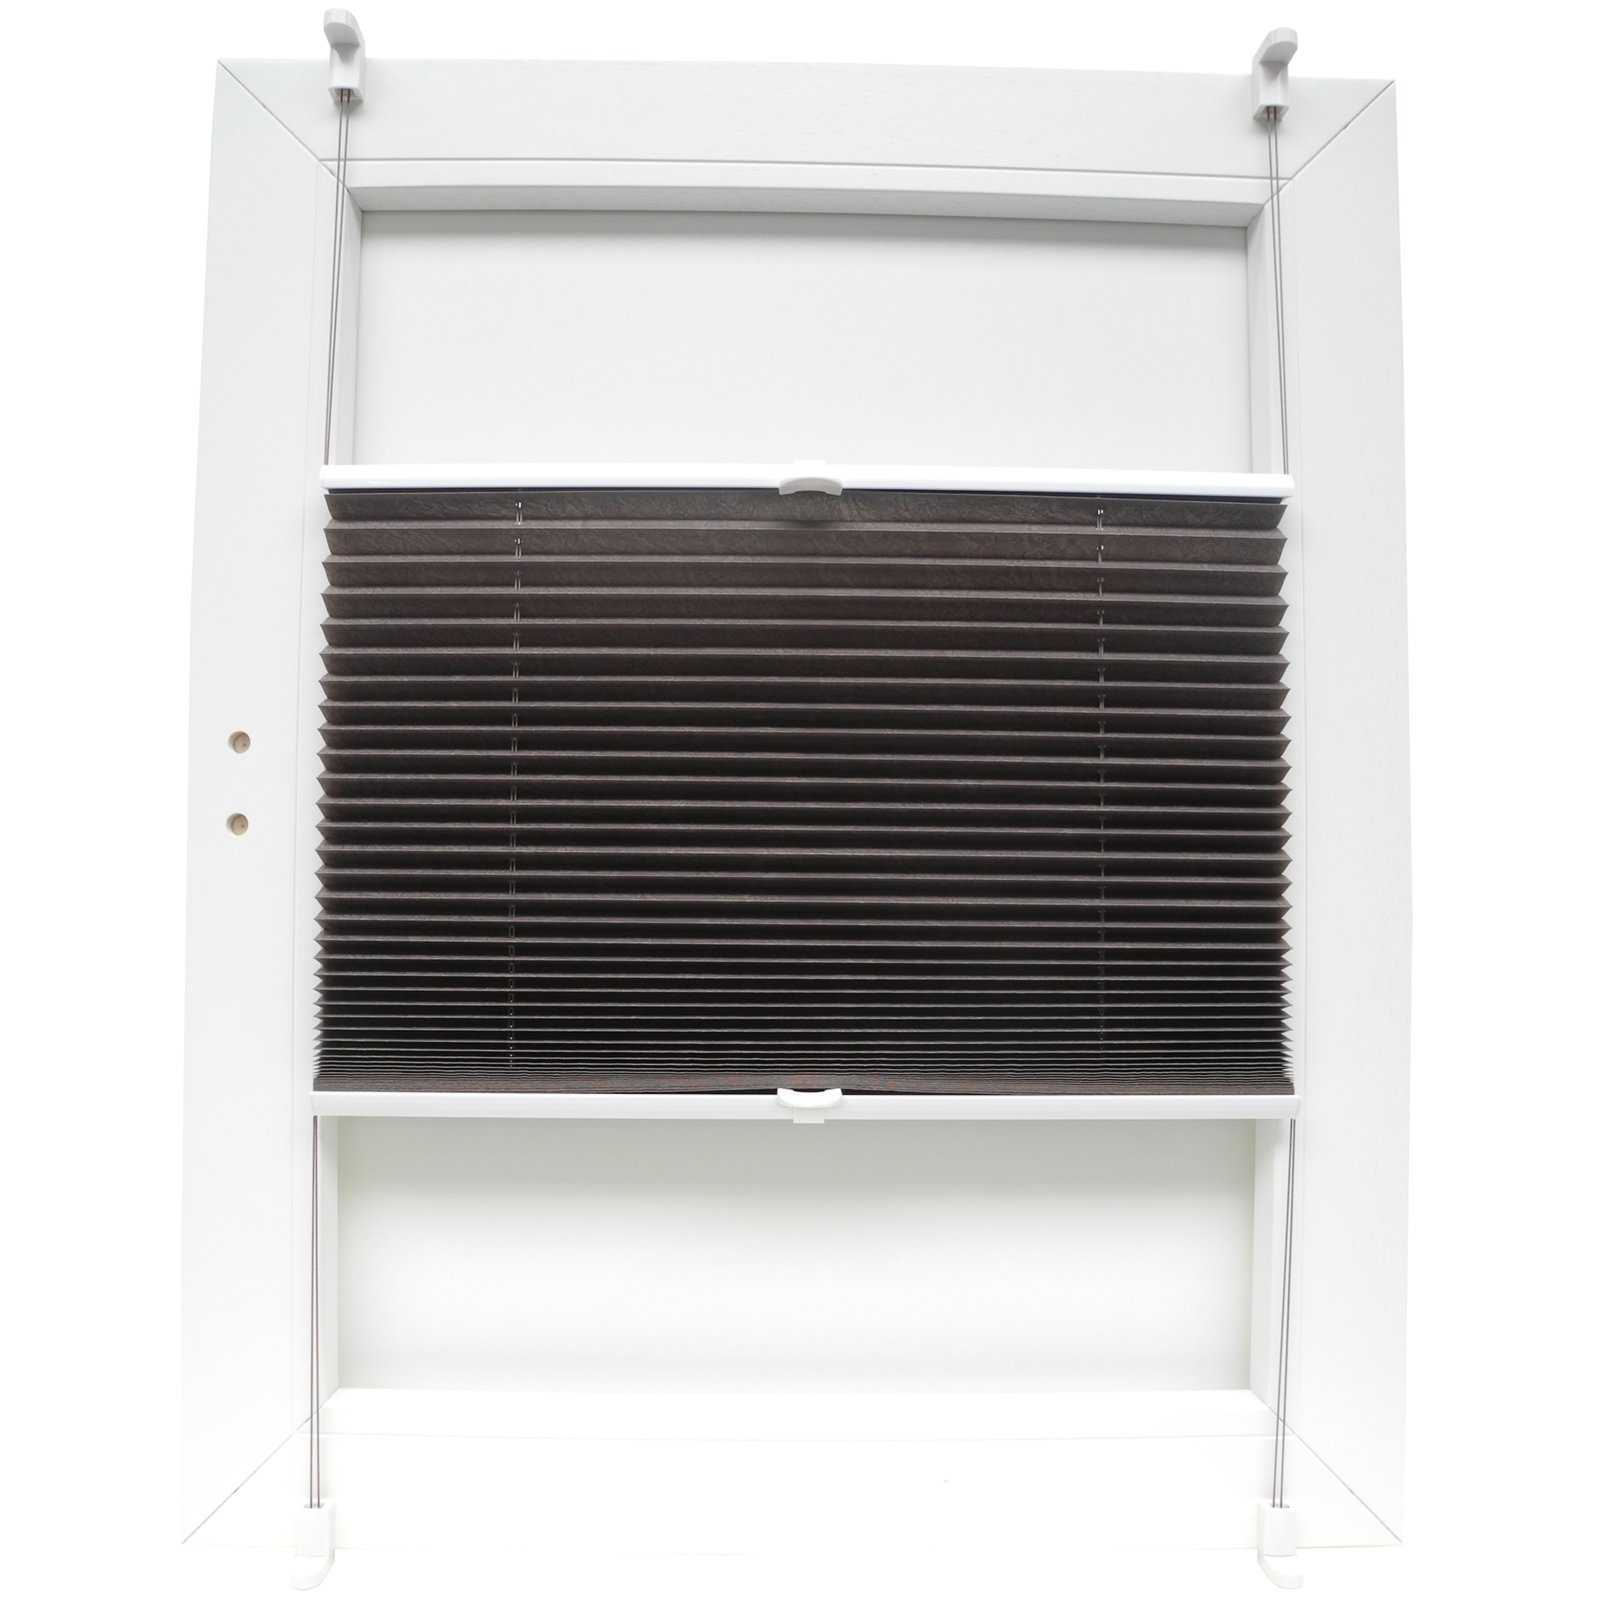 plissee sahara taupe 90x130 cm plissees rollos jalousien deko haushalt roller. Black Bedroom Furniture Sets. Home Design Ideas